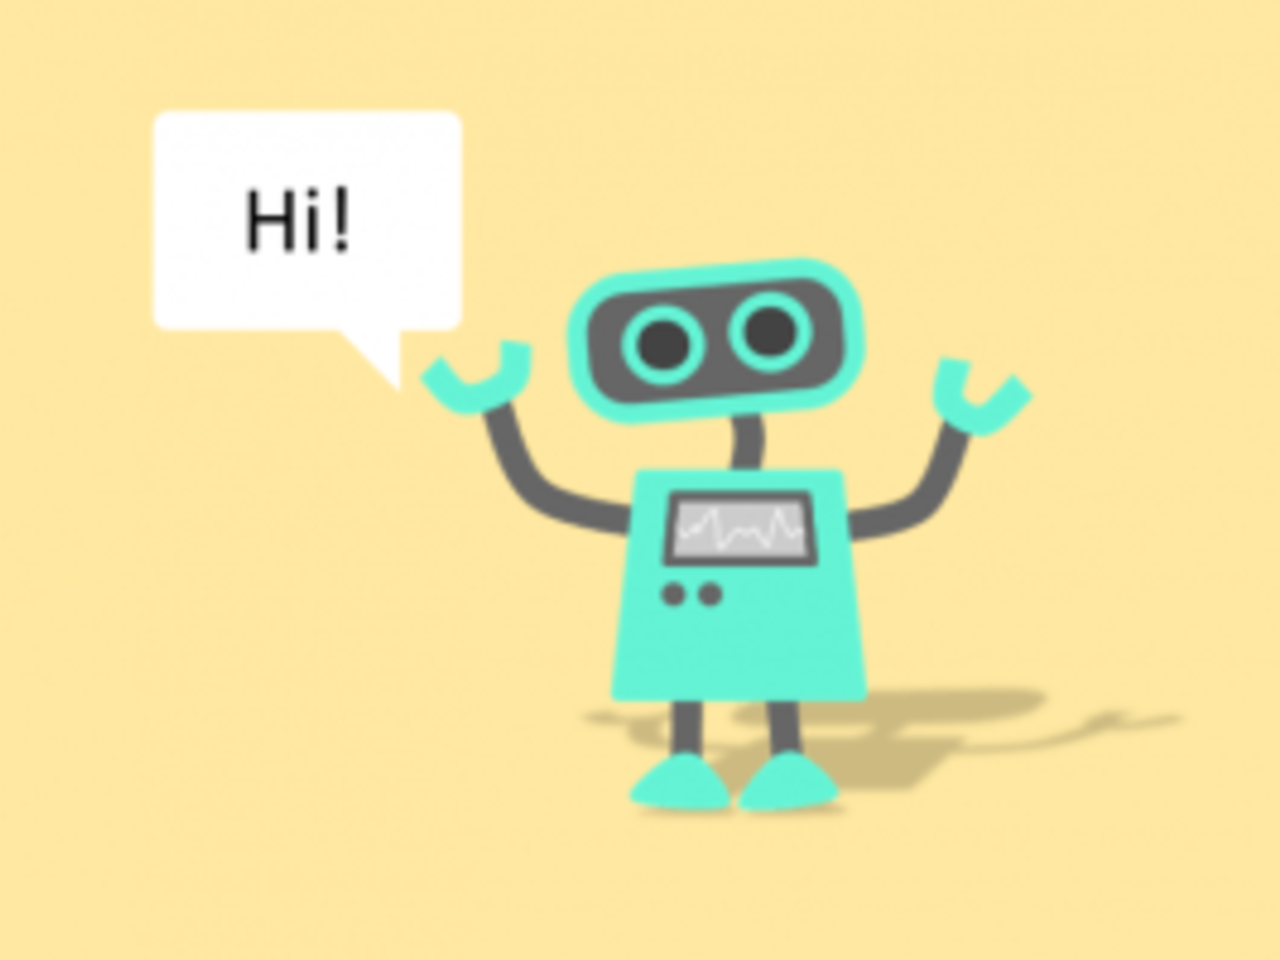 AI-based Conversation bot